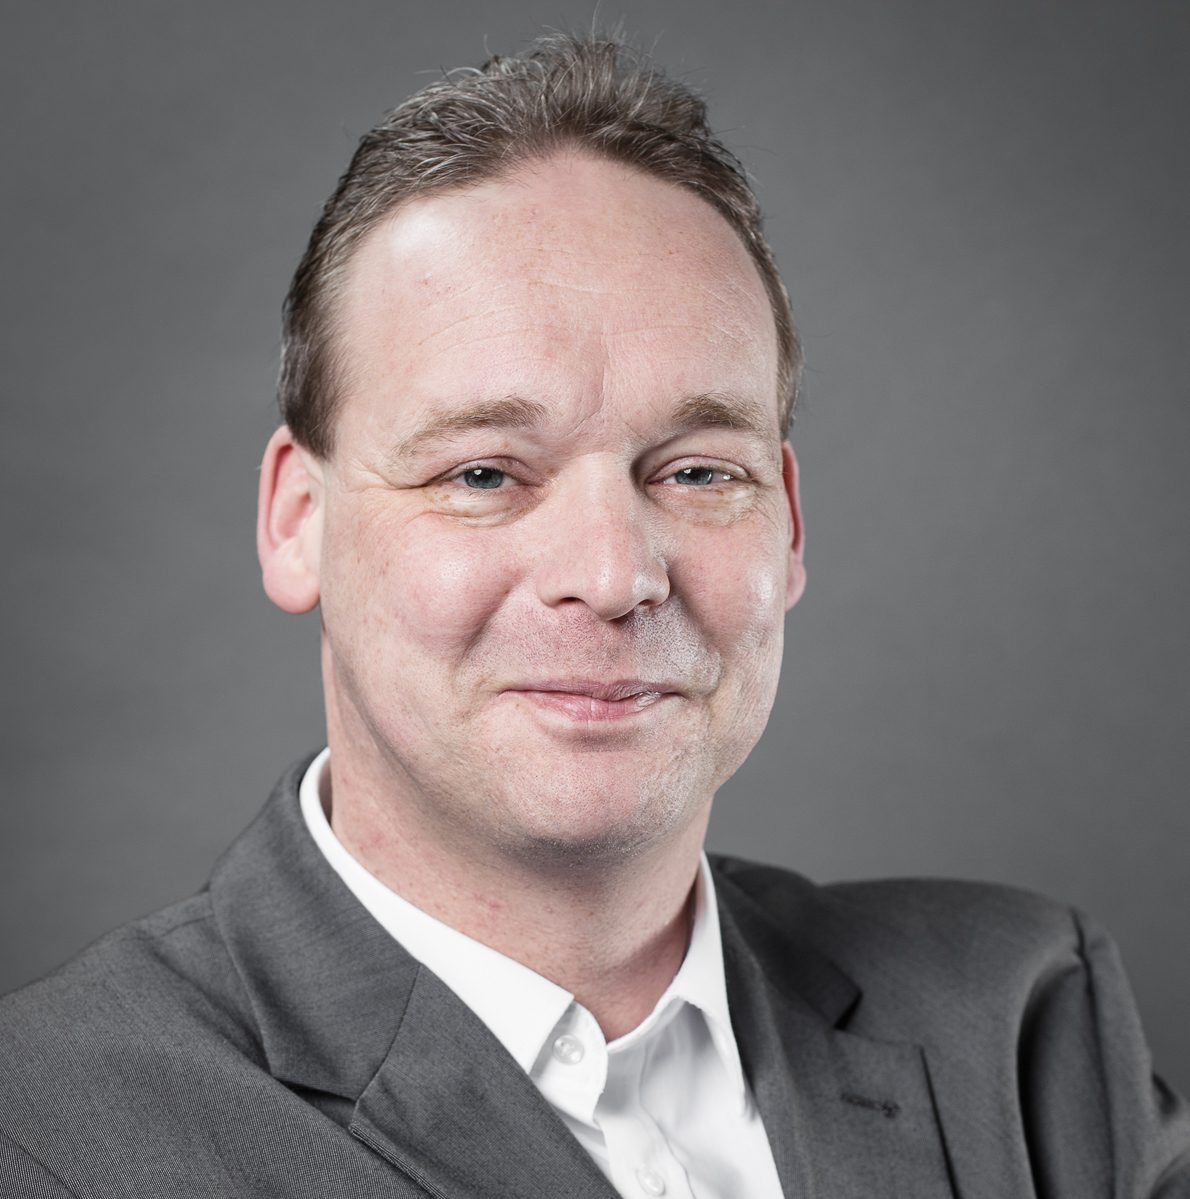 Thorsten Mentges